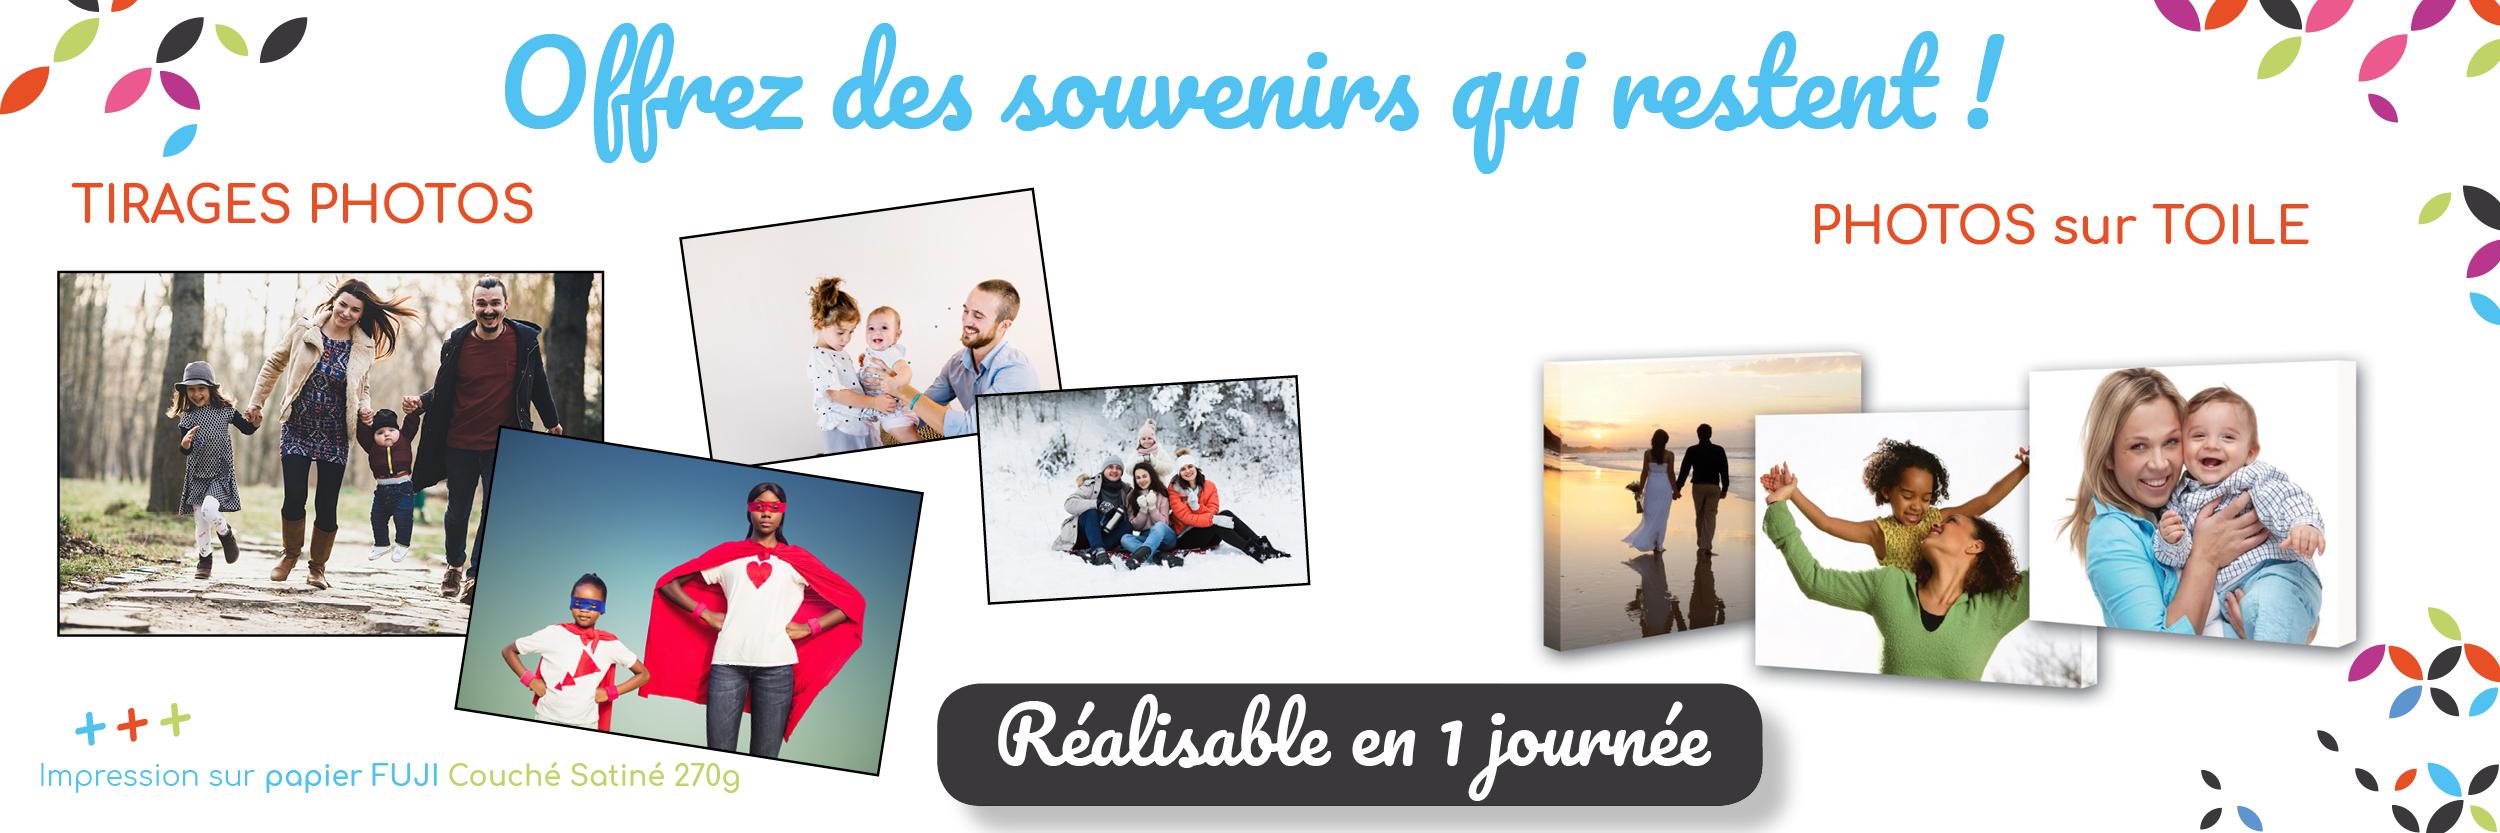 Bannières WEB_Totebag_Teeshirt_Tiragephotos-Copycolorbressuire_confetti2